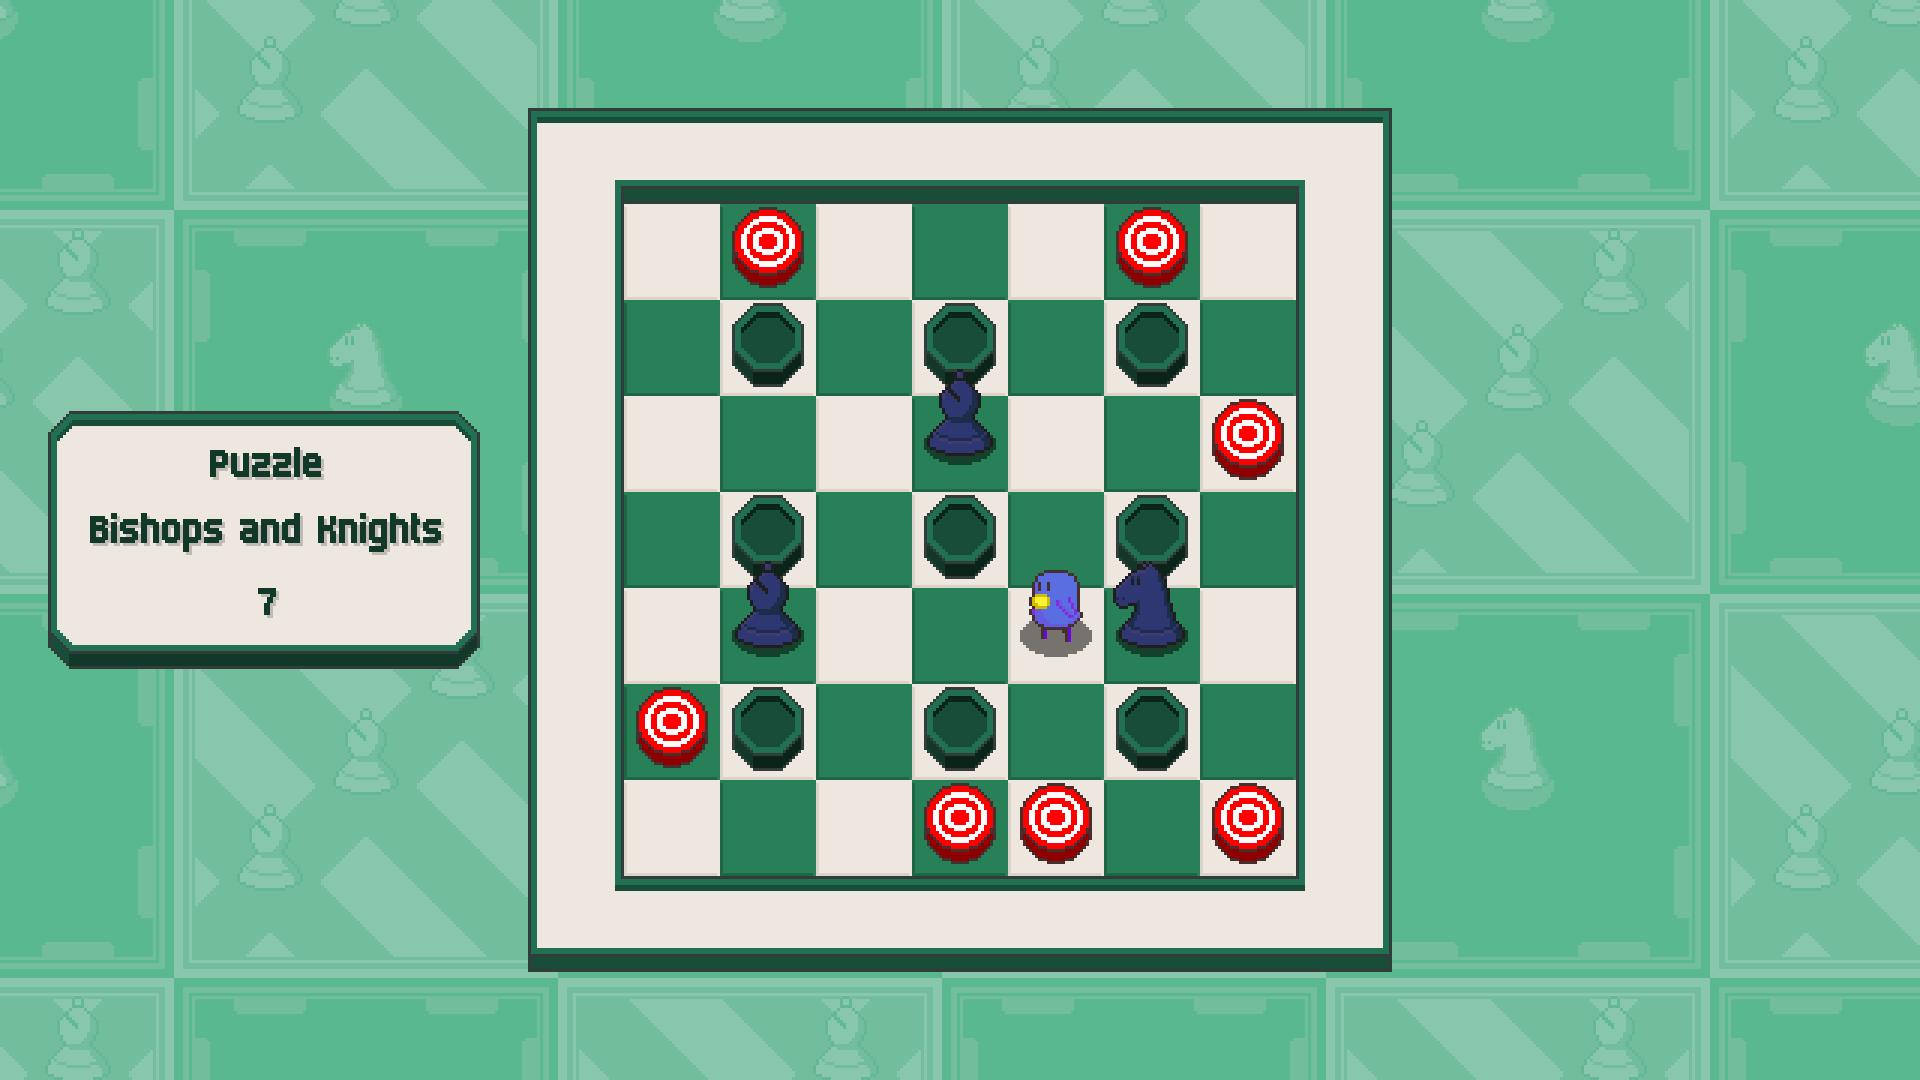 Chessplosion - Puzzle Solution Guide + Achievements Walkthrough - Grandblaster: Bishops and Knights - 4FCD815